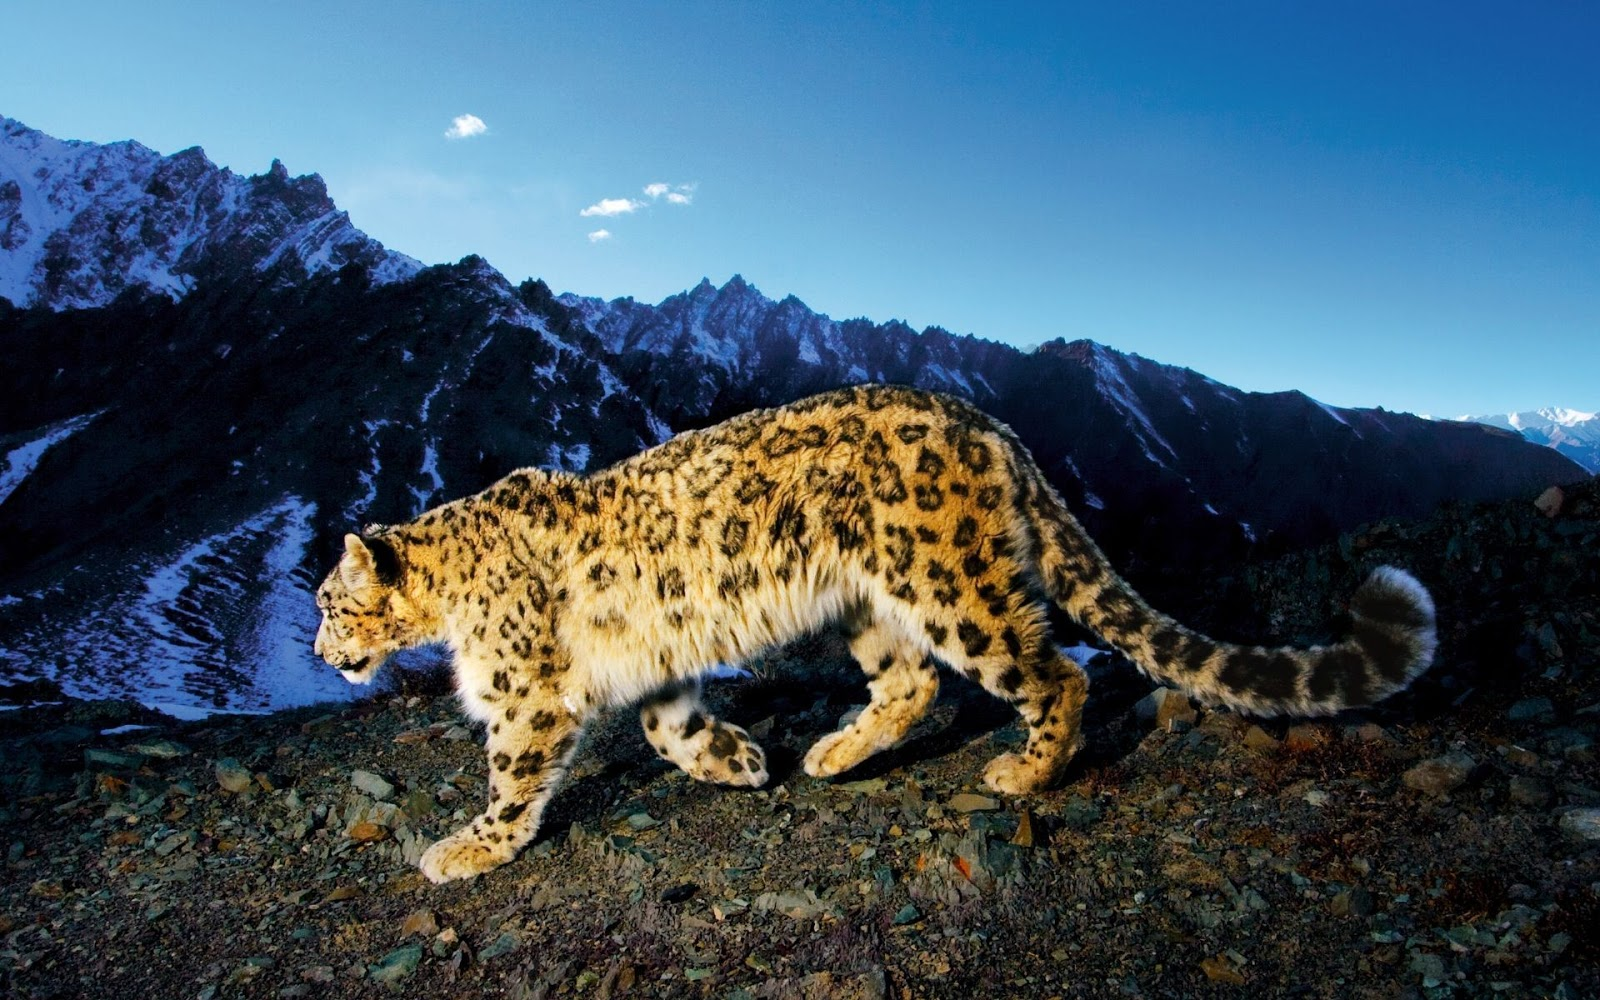 http://1.bp.blogspot.com/--IePluV7b3M/UKAqUGhFgZI/AAAAAAAACaM/R2W_09bJIks/s1600/Leopard+in+winter+wallpaper+(1920+x+1200).jpg